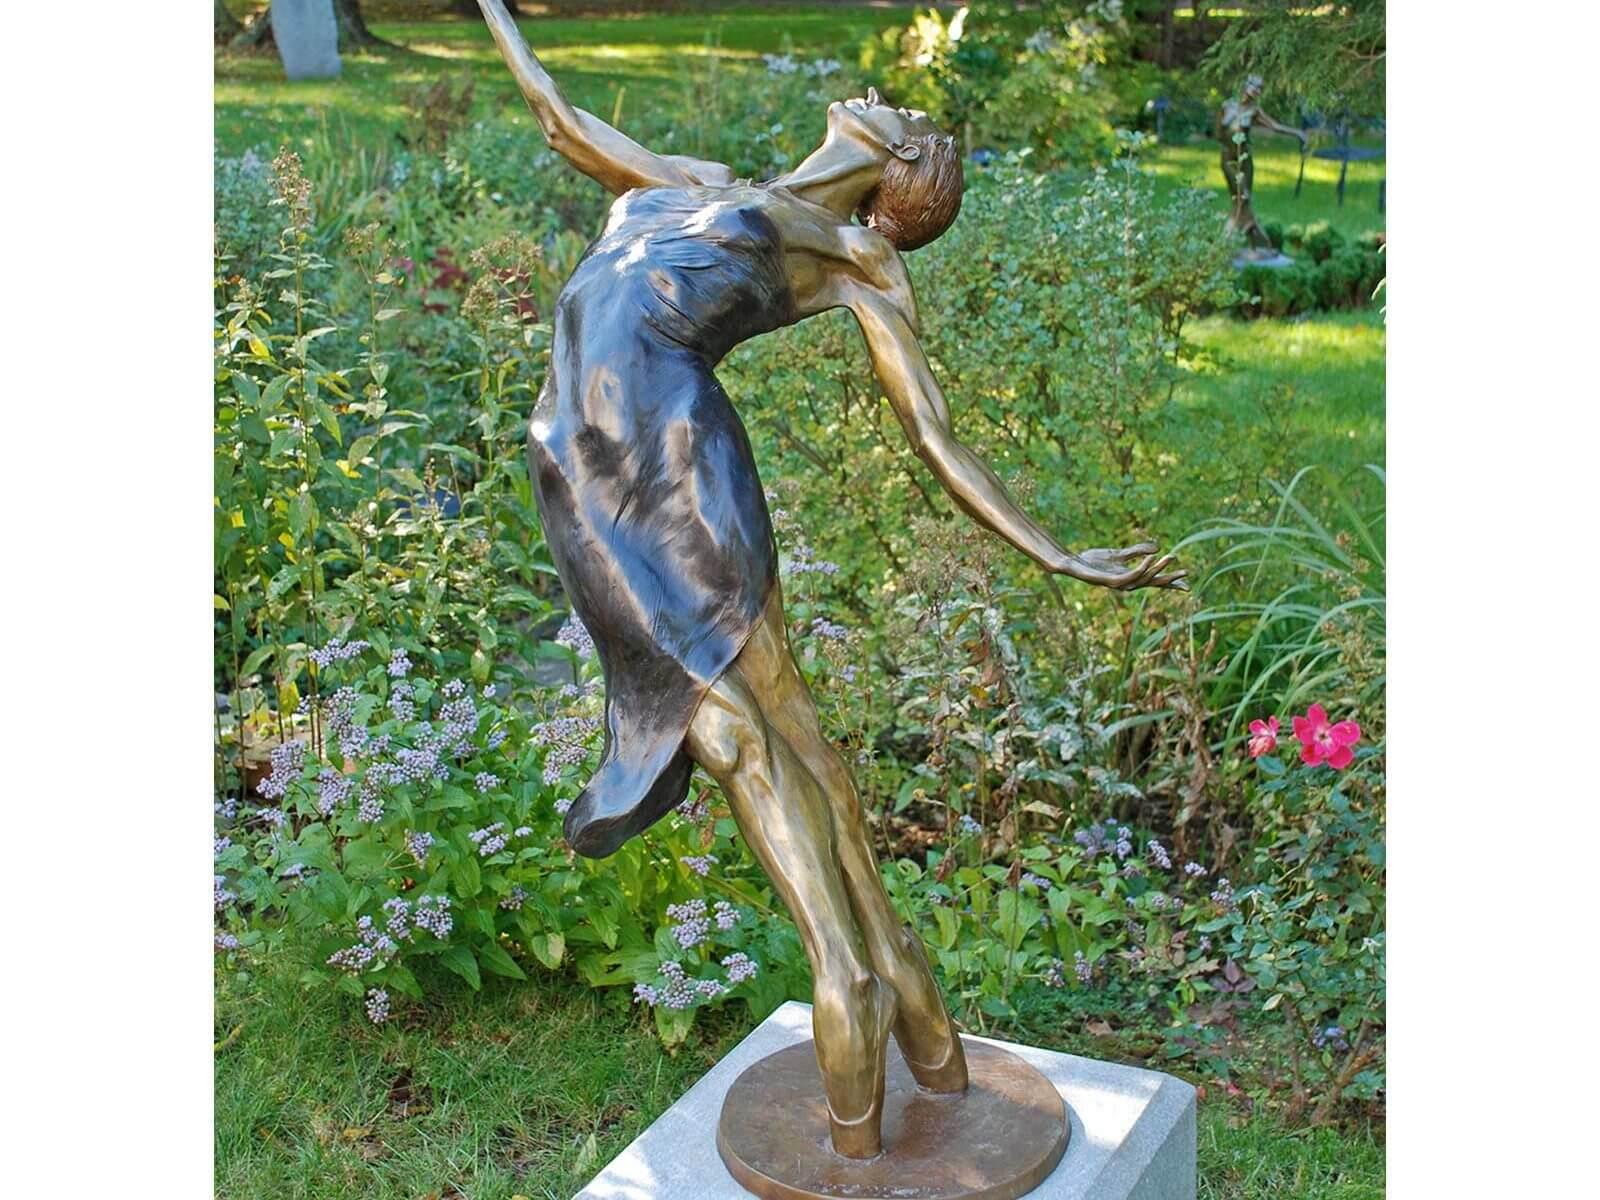 Pleiades a Female Bronze Dance Figurative Outdoor Garden Sculpture by Andrew DeVries